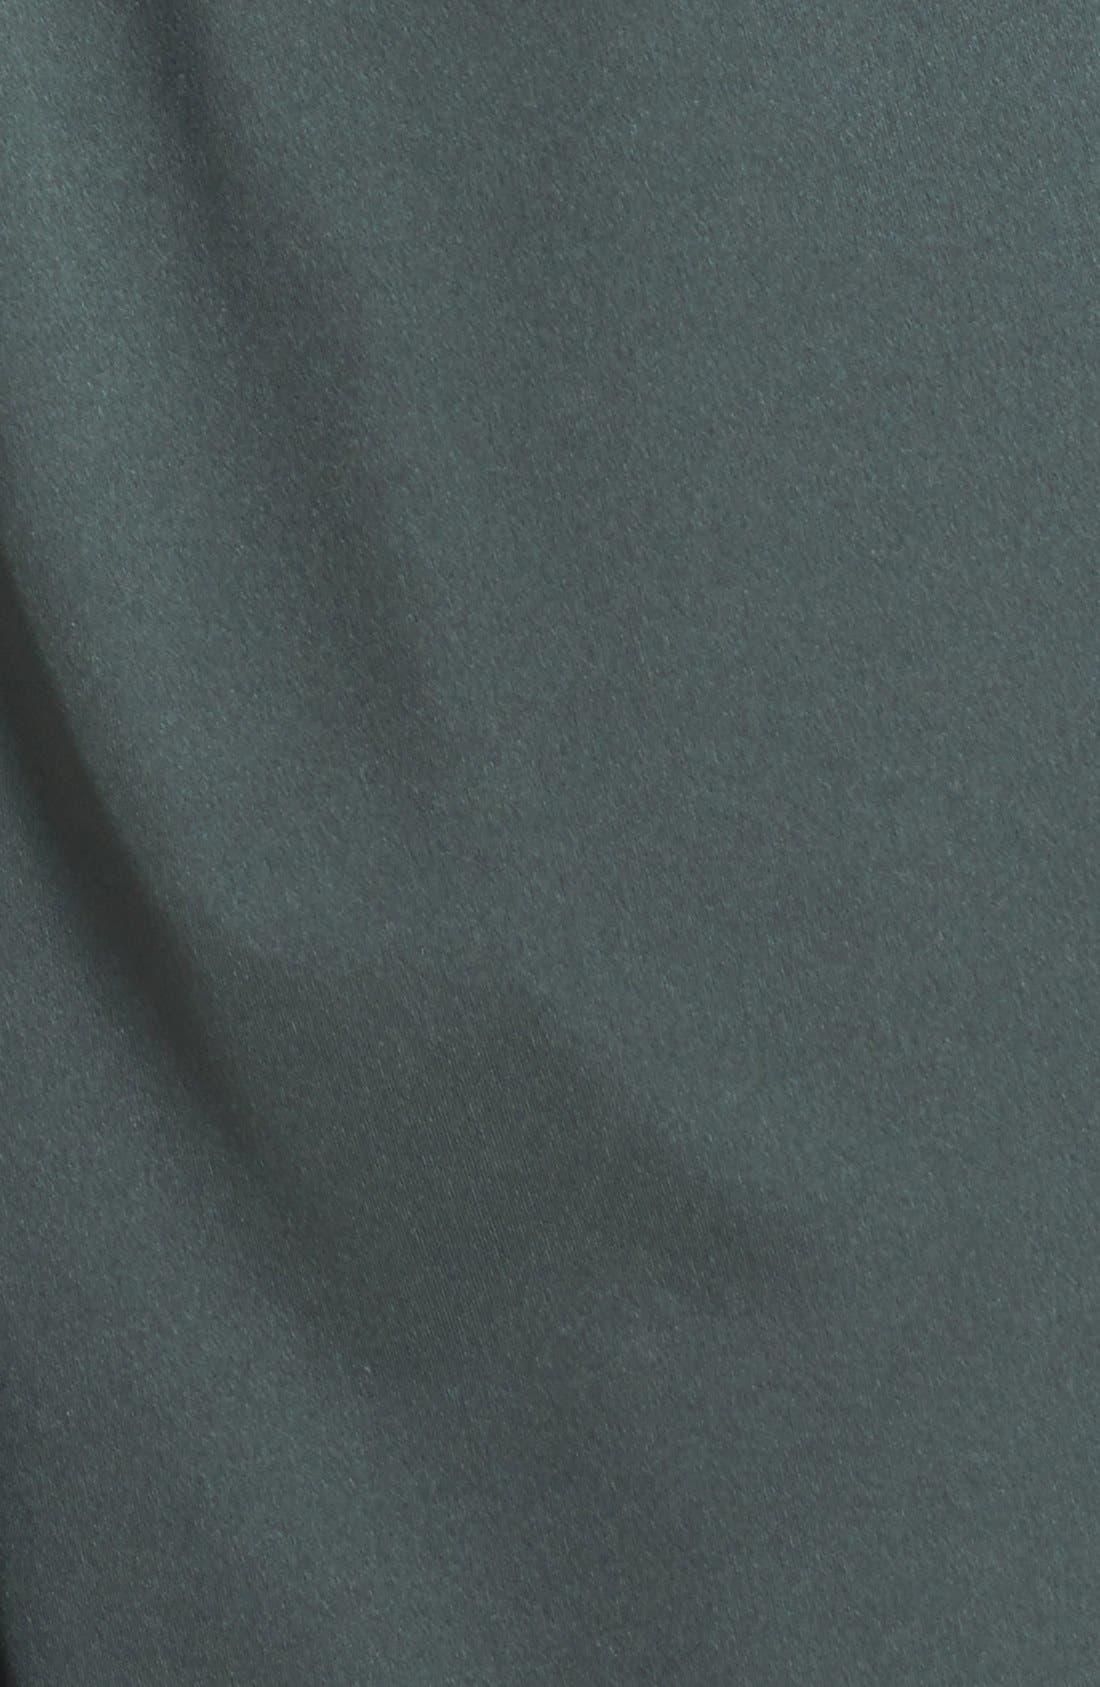 Alternate Image 3  - Nike 'Fly 2.0' Dri-FIT Knit Training Shorts